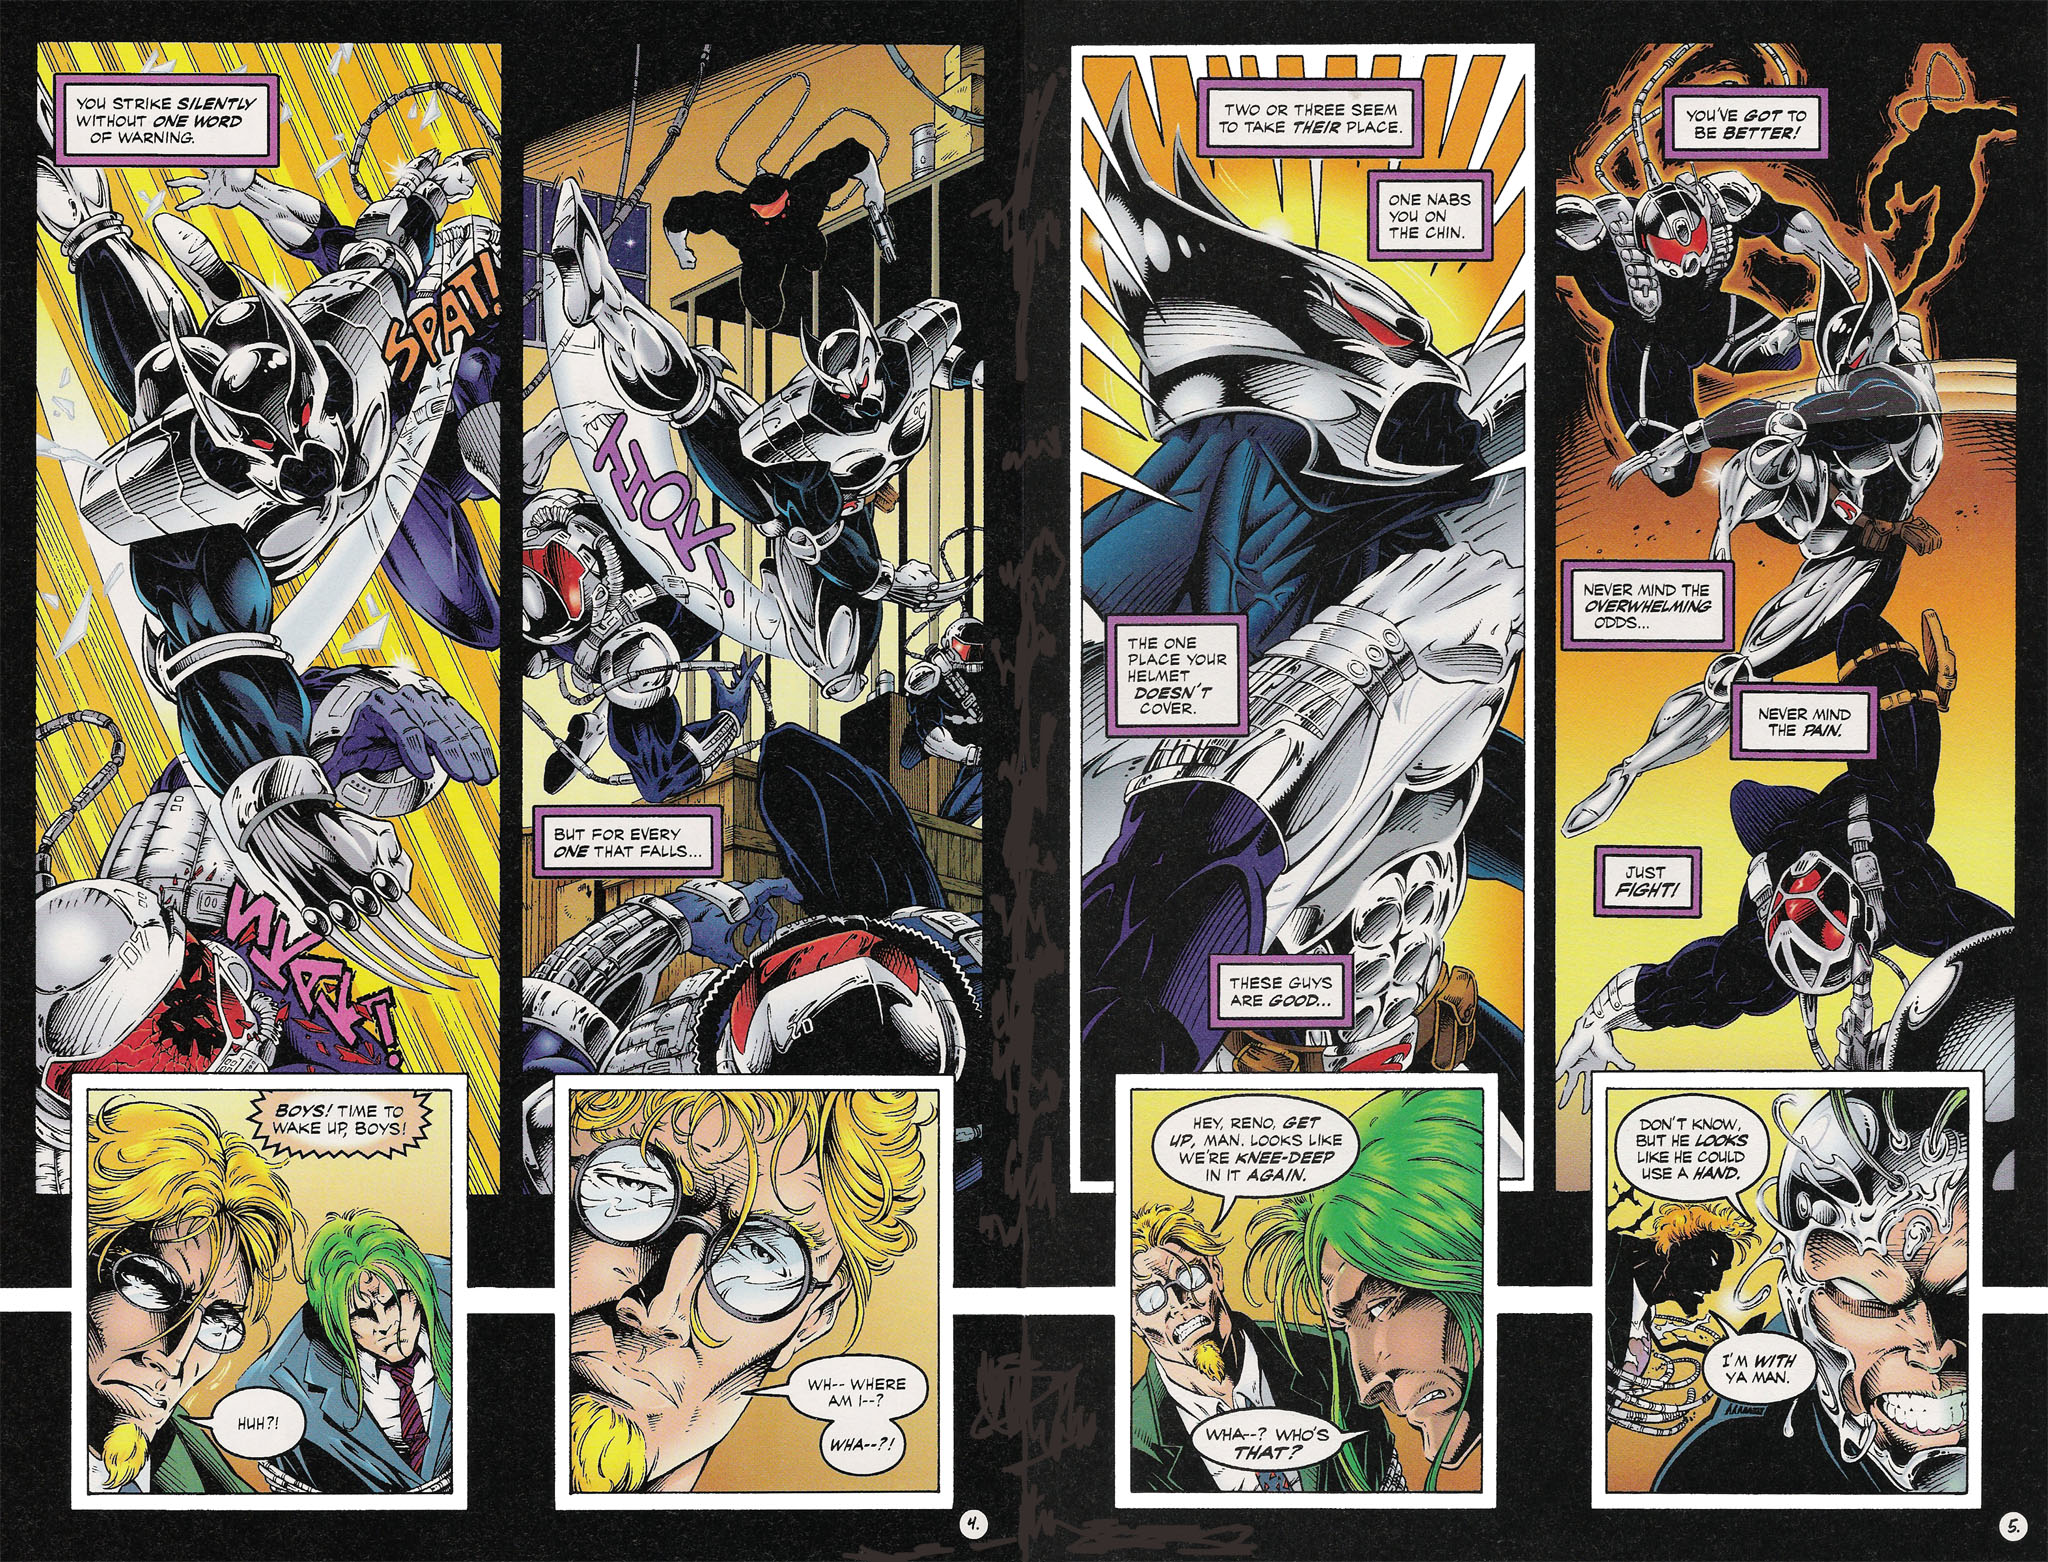 Read online ShadowHawk comic -  Issue #13 - 5